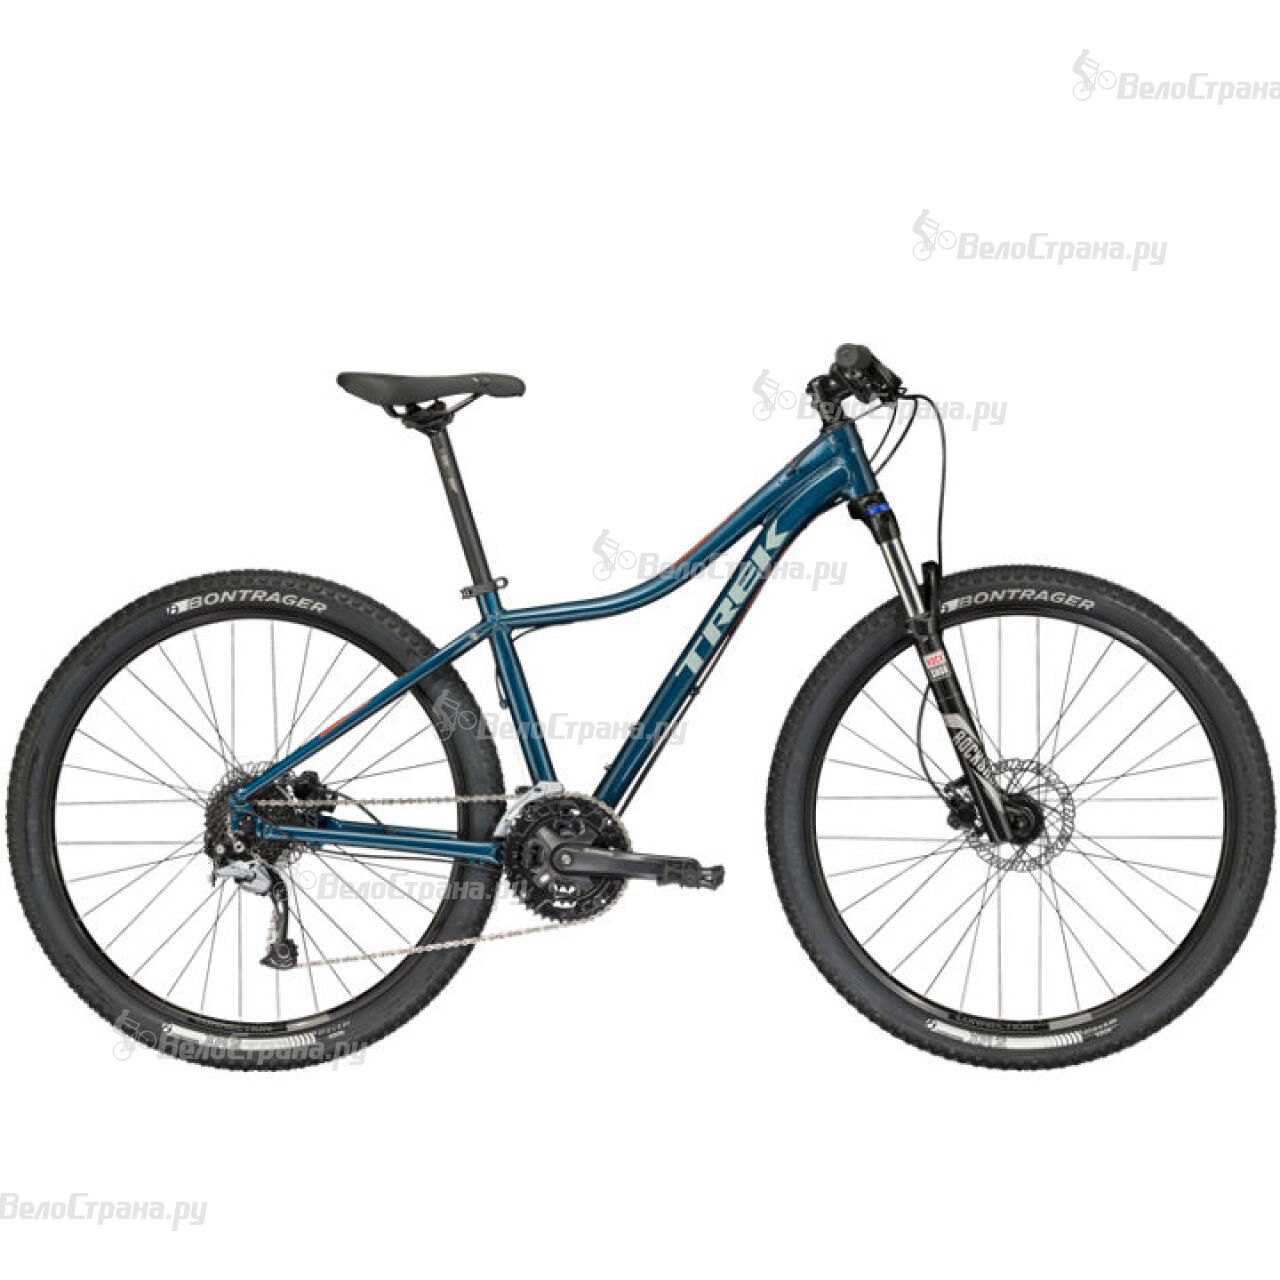 Велосипед Trek Cali S WSD 29 (2017) велосипед trek madone 3 1 wsd 2013